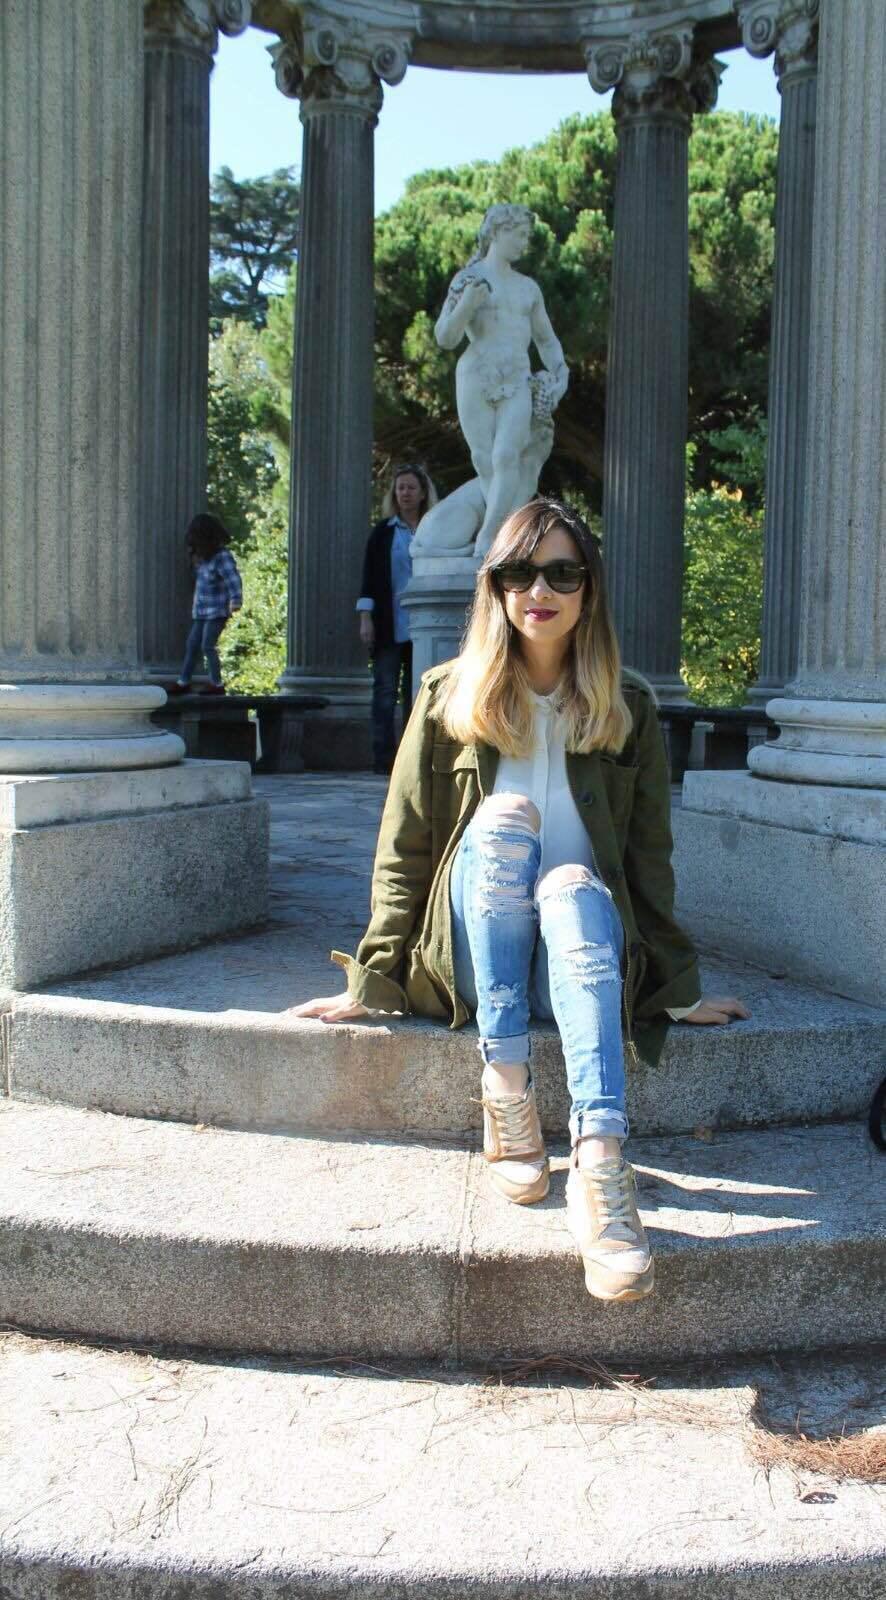 marikowskaya-street-style-daniela-ripped-jeans-5